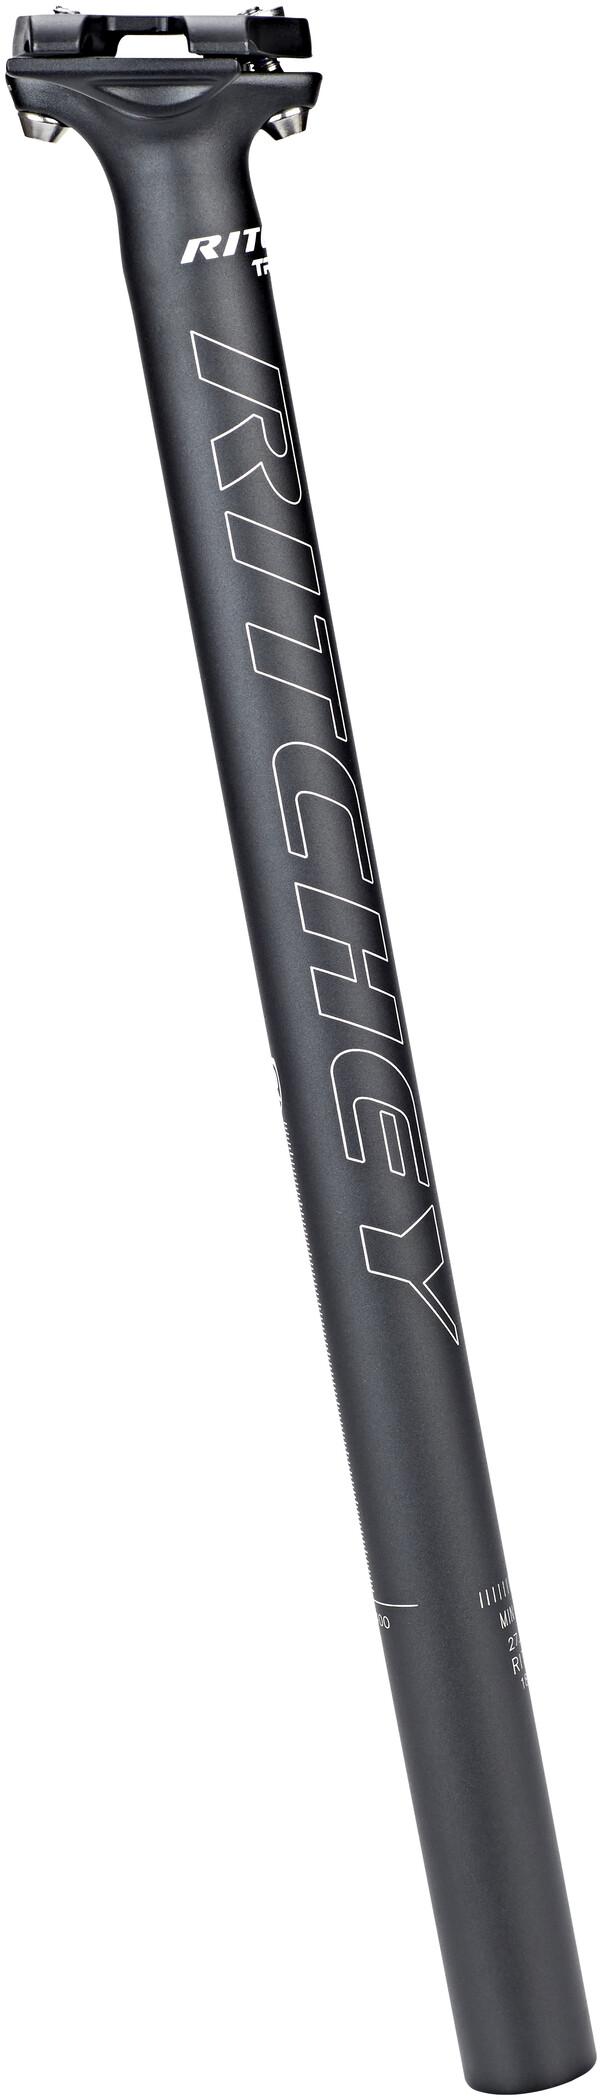 Ritchey Comp Trail Sadelpind Ø27,2mm, bb black (2019) | Seat posts